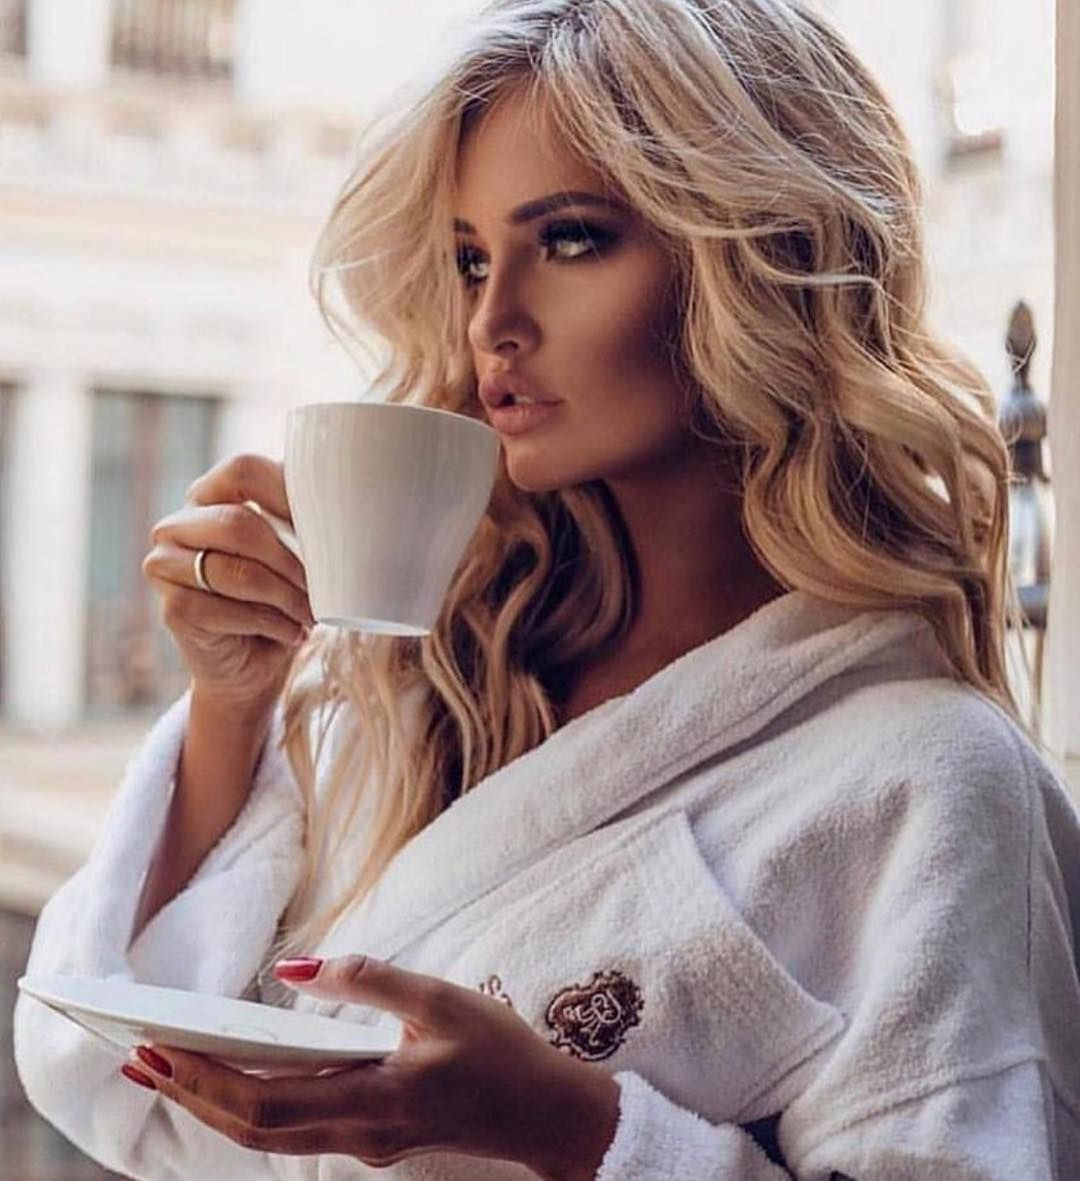 Девушка с добрым утром фото картинки